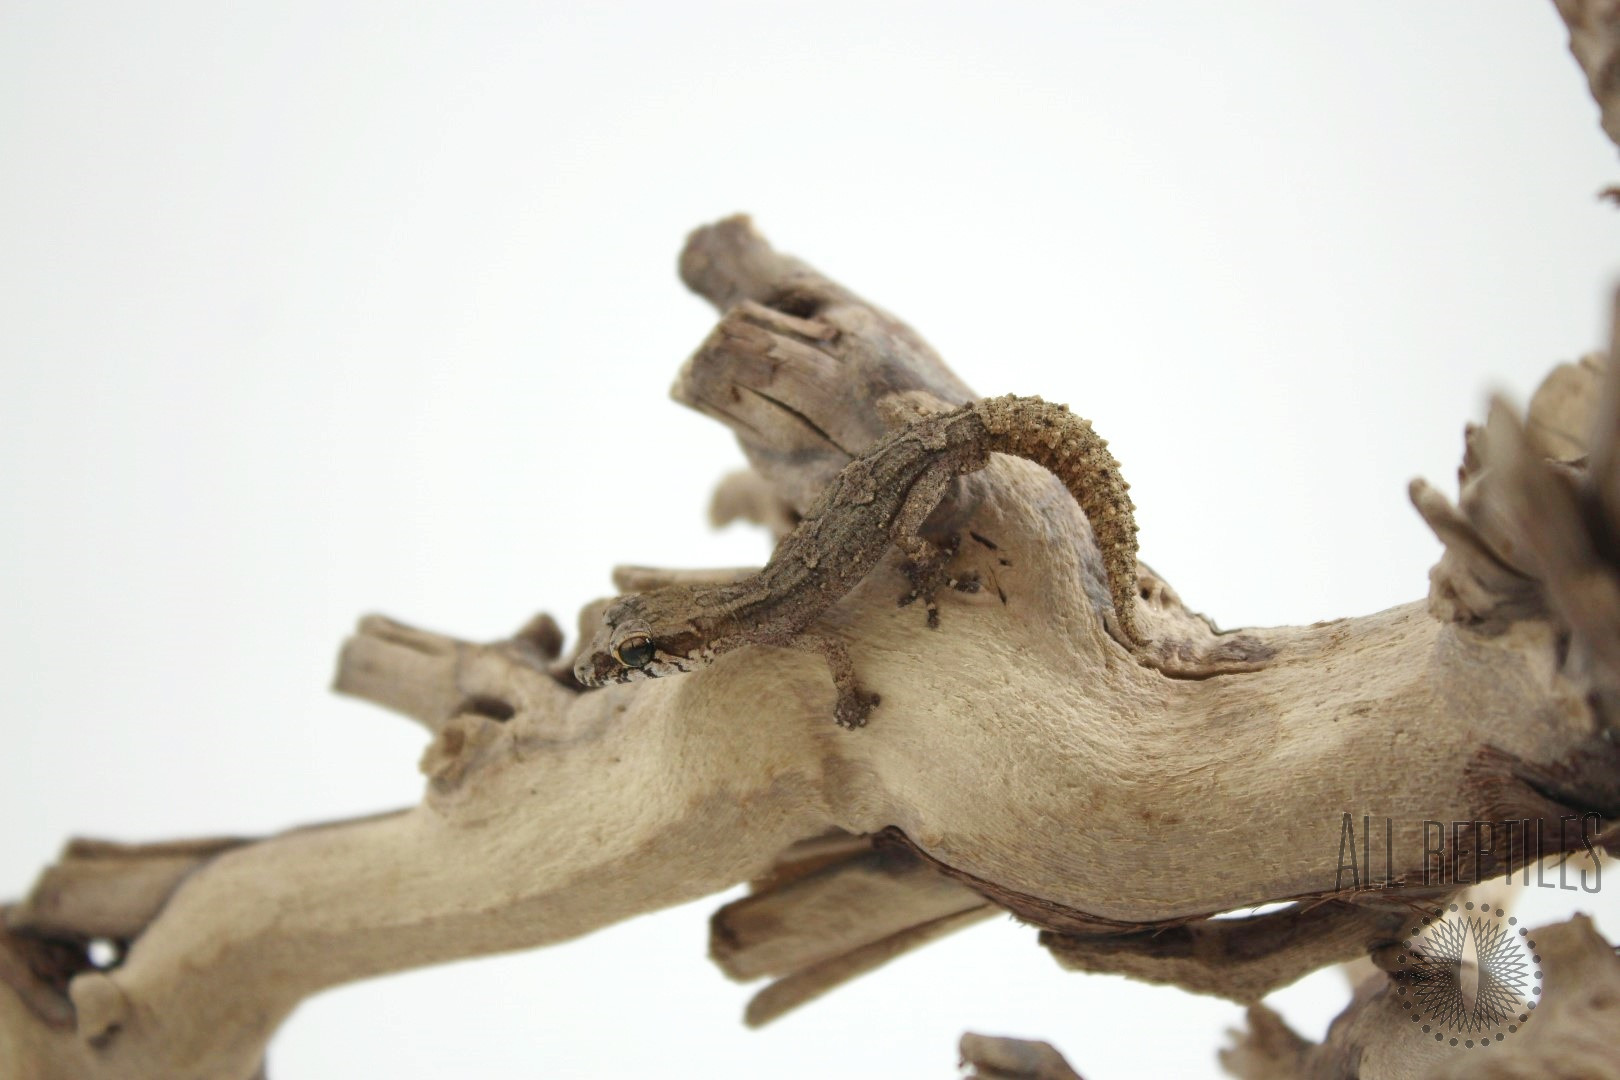 Androyensis Dwarf Gecko